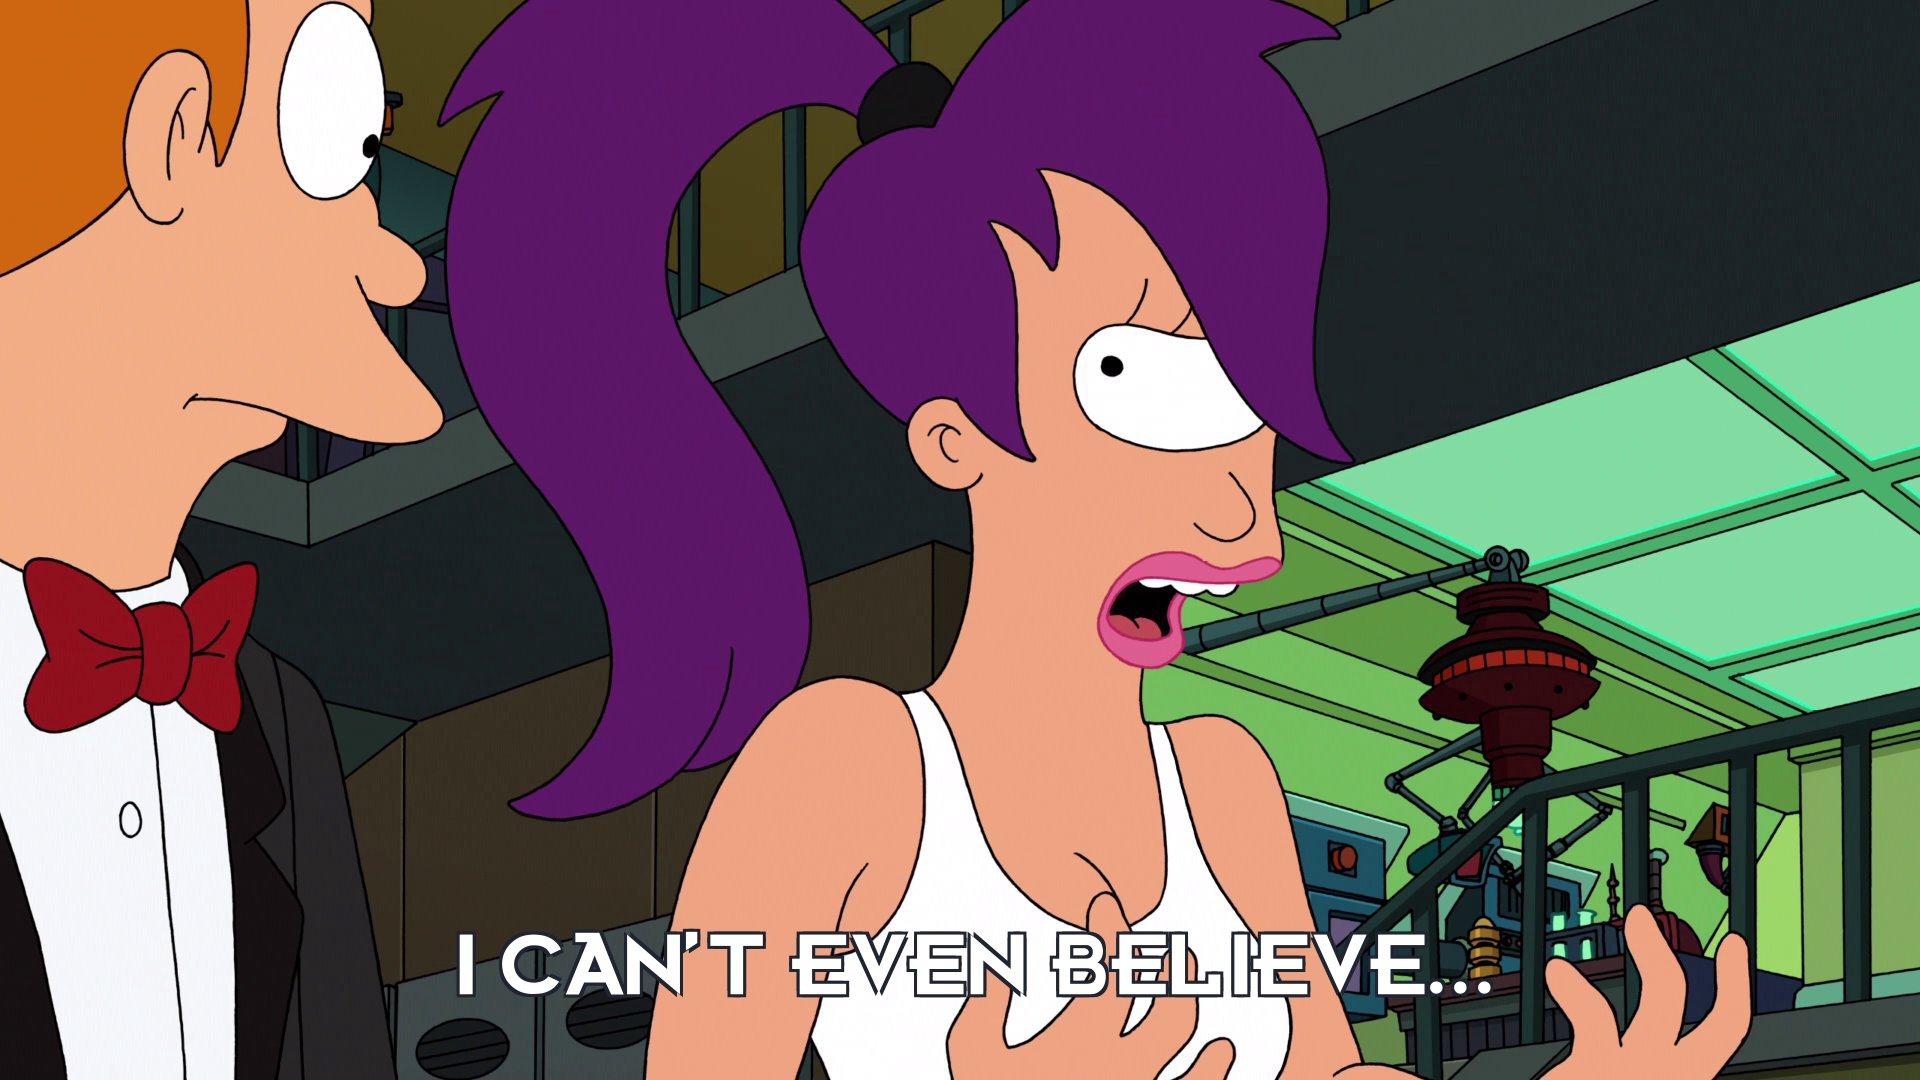 Turanga Leela: I can't even believe...